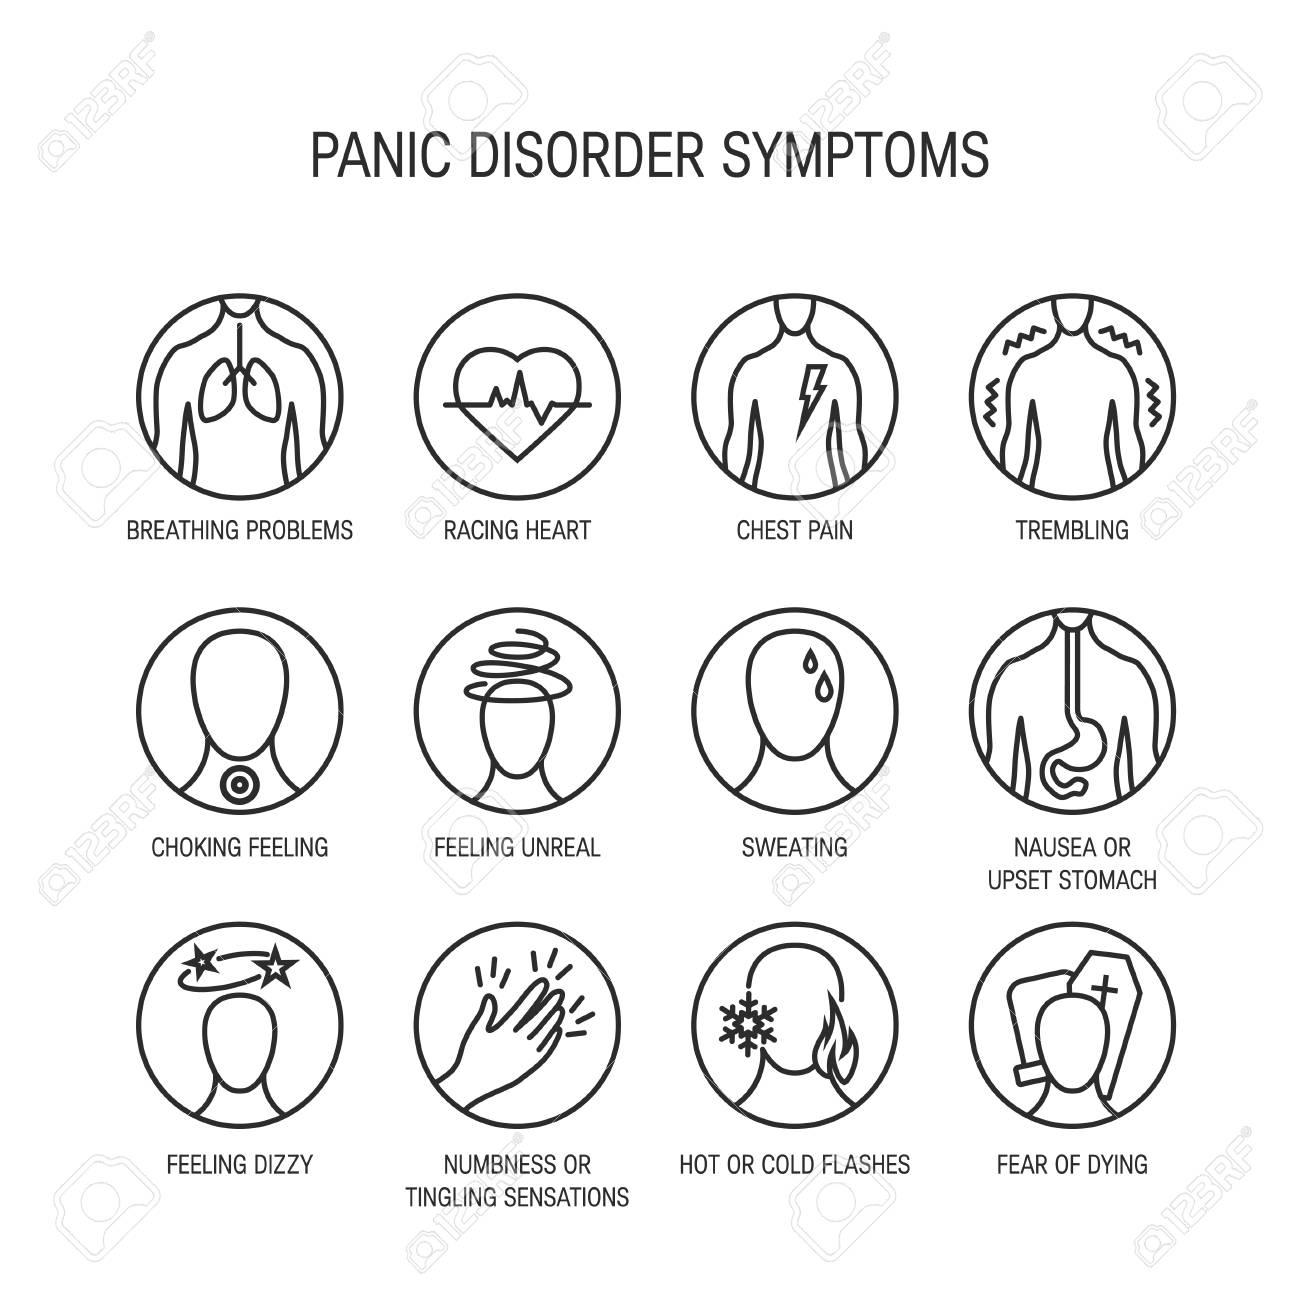 Panic attack symptoms, line icons, vector illustration. - 110232720